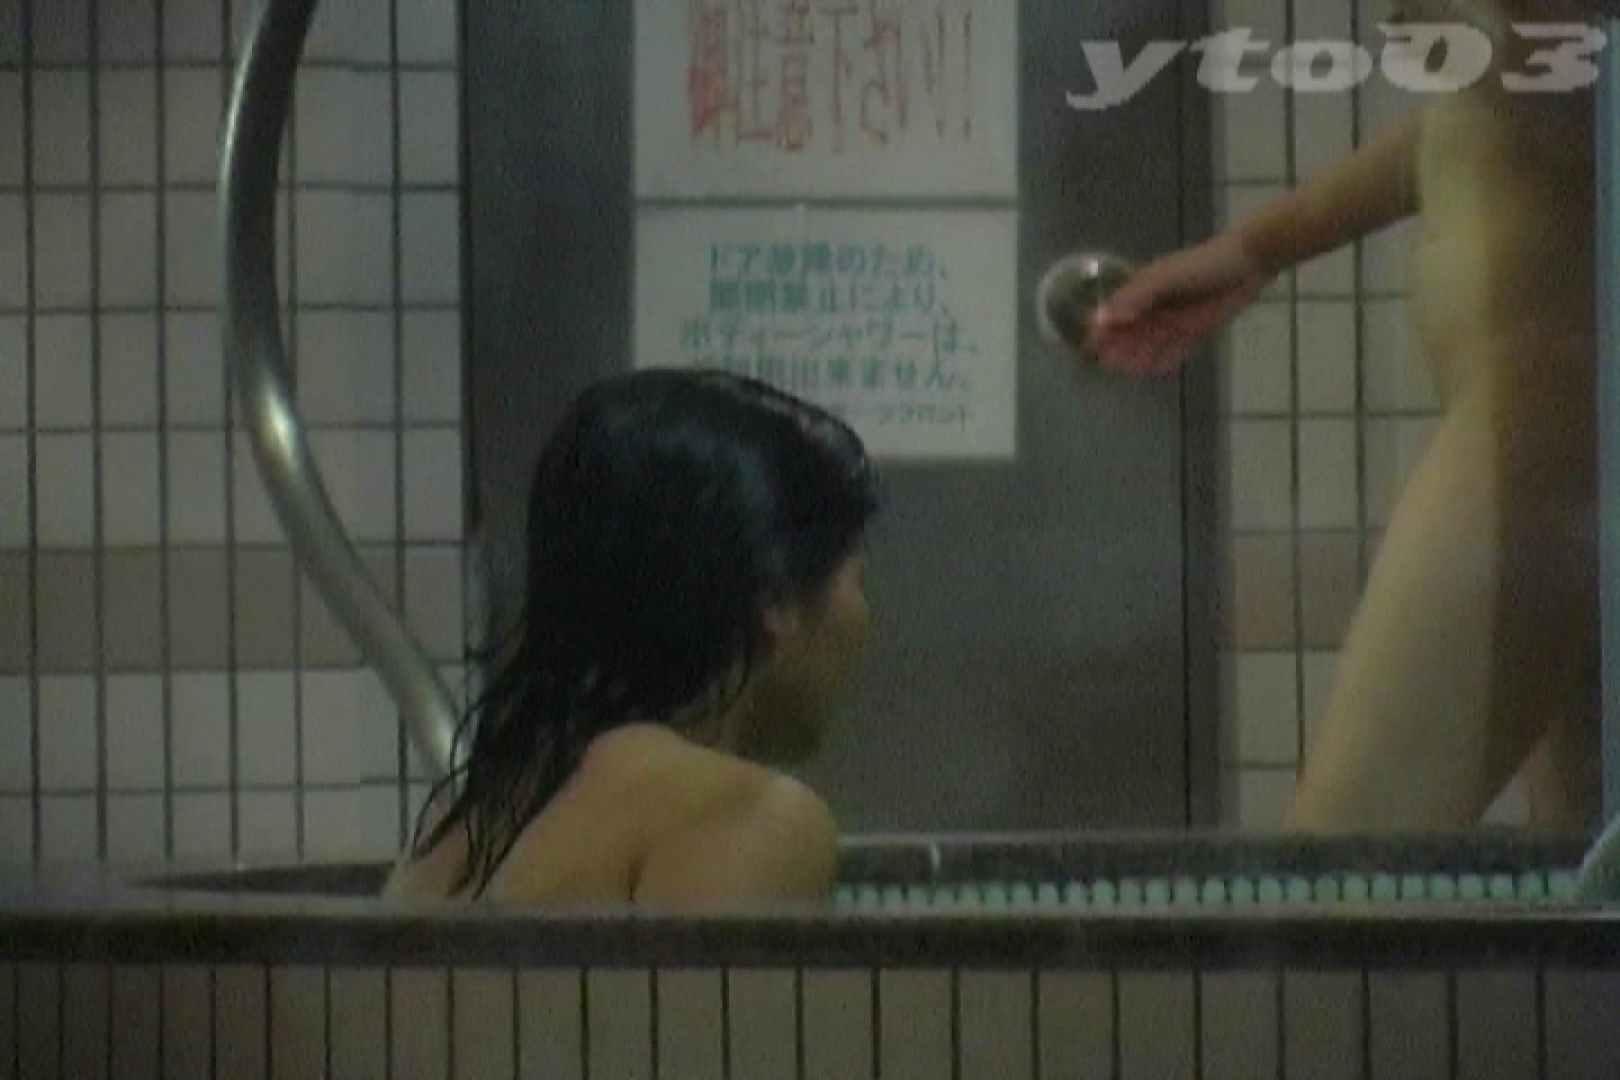 ▲復活限定▲合宿ホテル女風呂盗撮 Vol.17 合宿中の出来事 盗撮 100画像 80